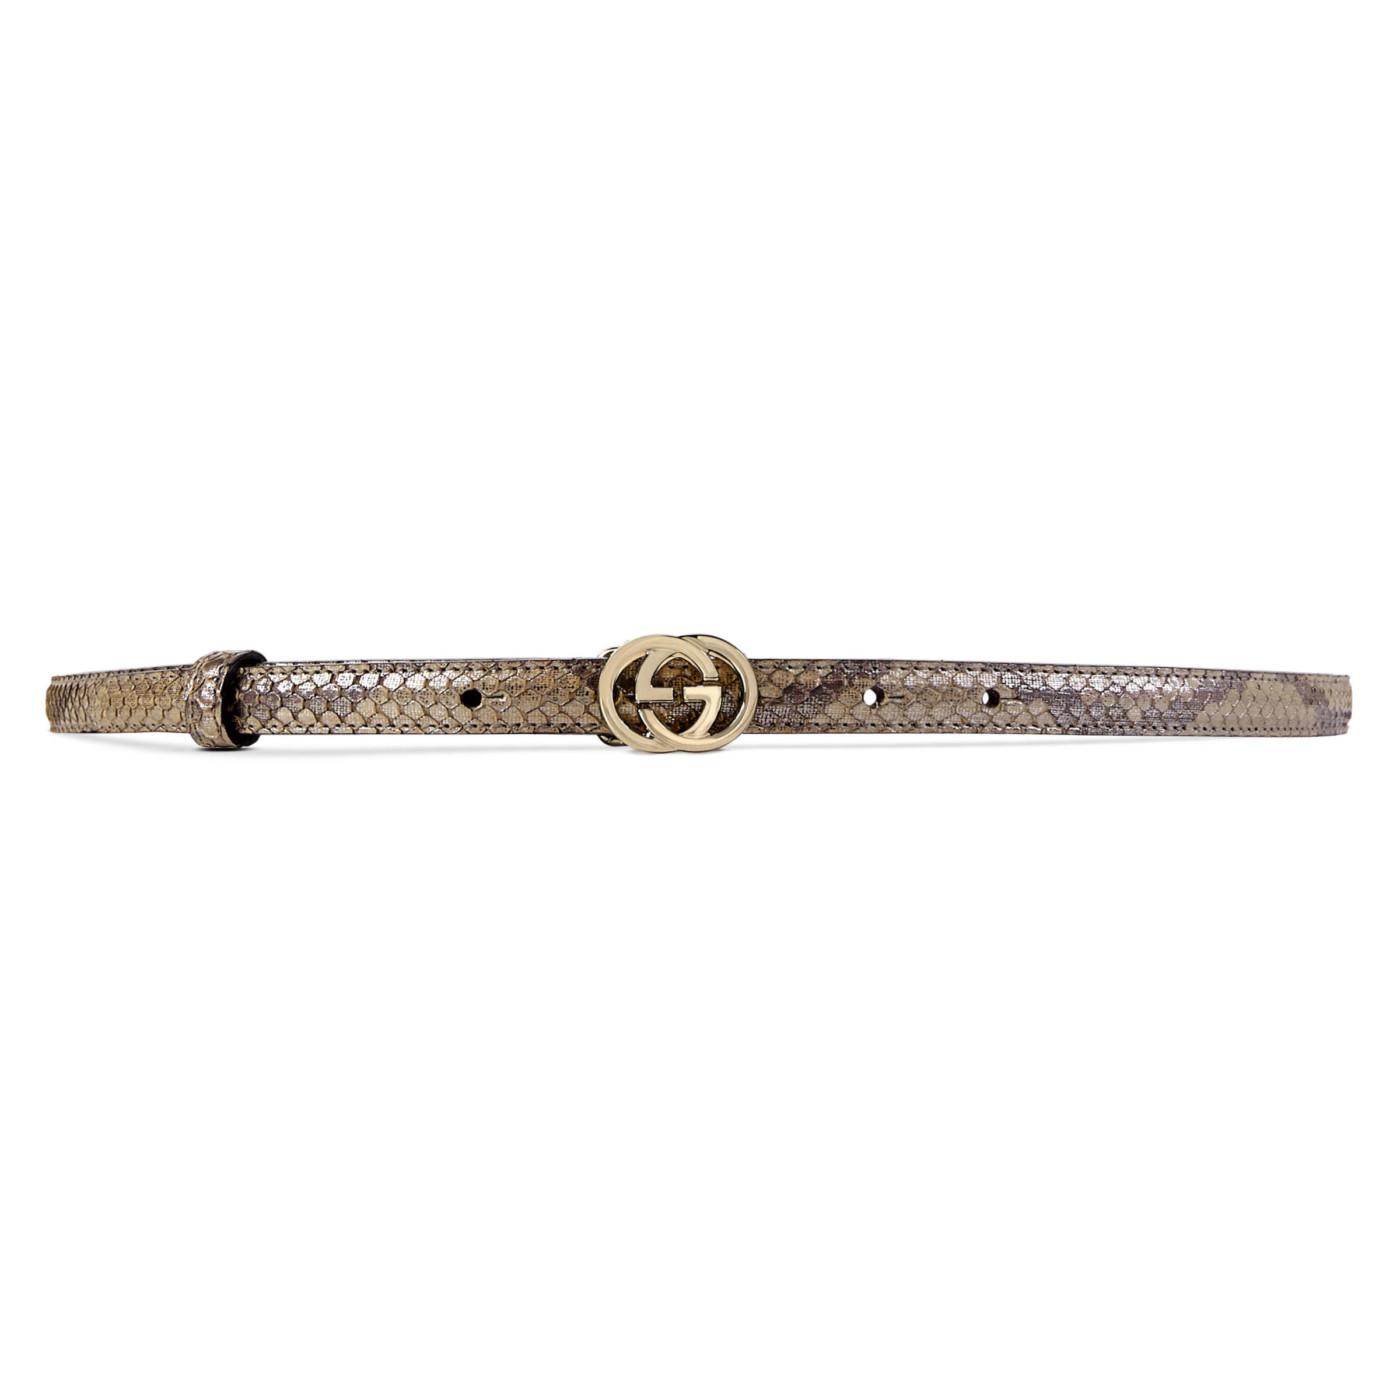 eda916f30 Gucci Women's Brown Python Interlocking GG Buckle Skinny Belt